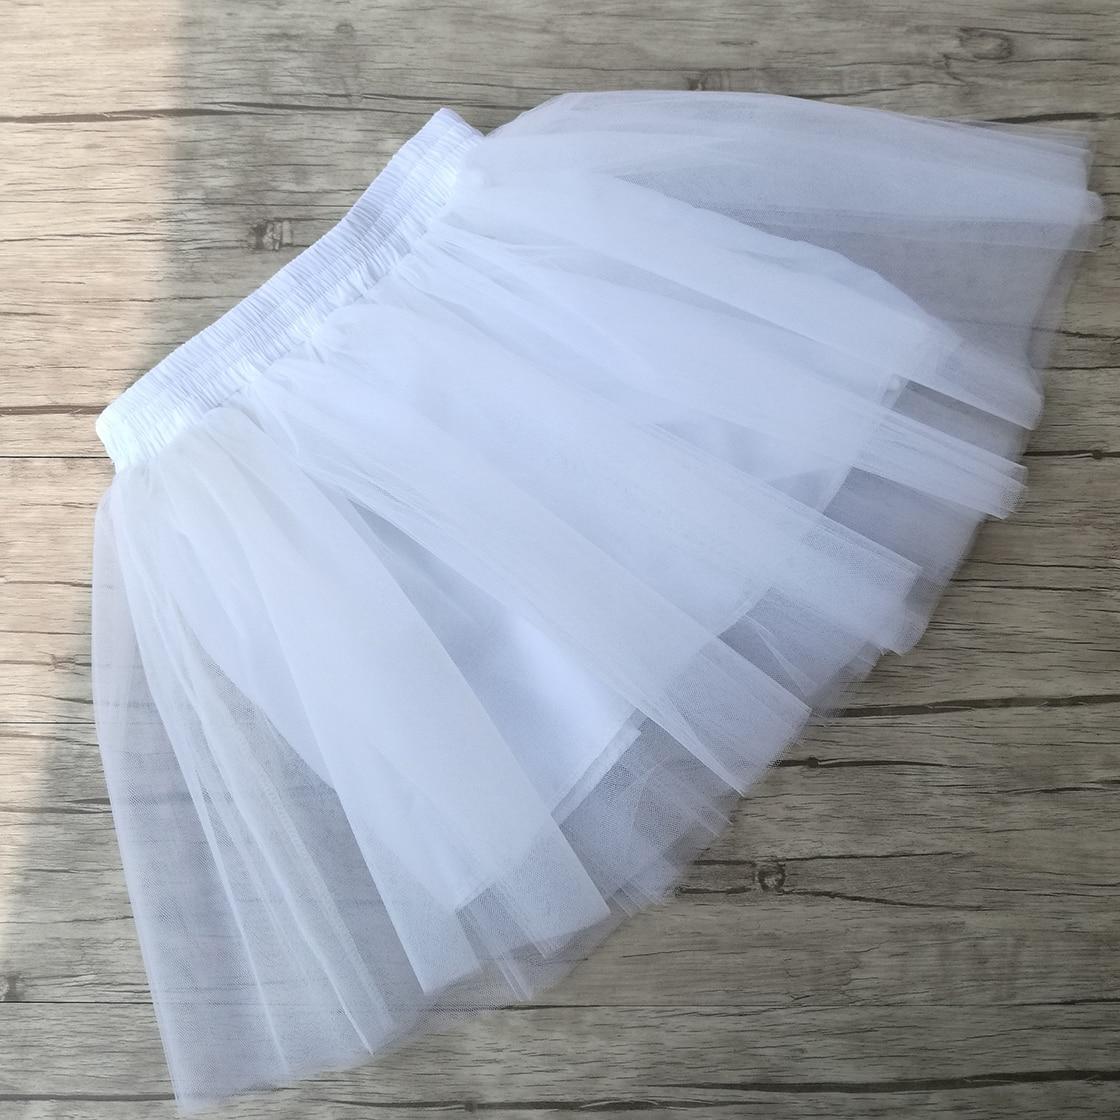 Summer Womens Mini Tulle Skirt Fairy Style Custom Made 5 layers saia Voile Bouffant Puffy Fashion Skirt Summer Tutu Skirts 2